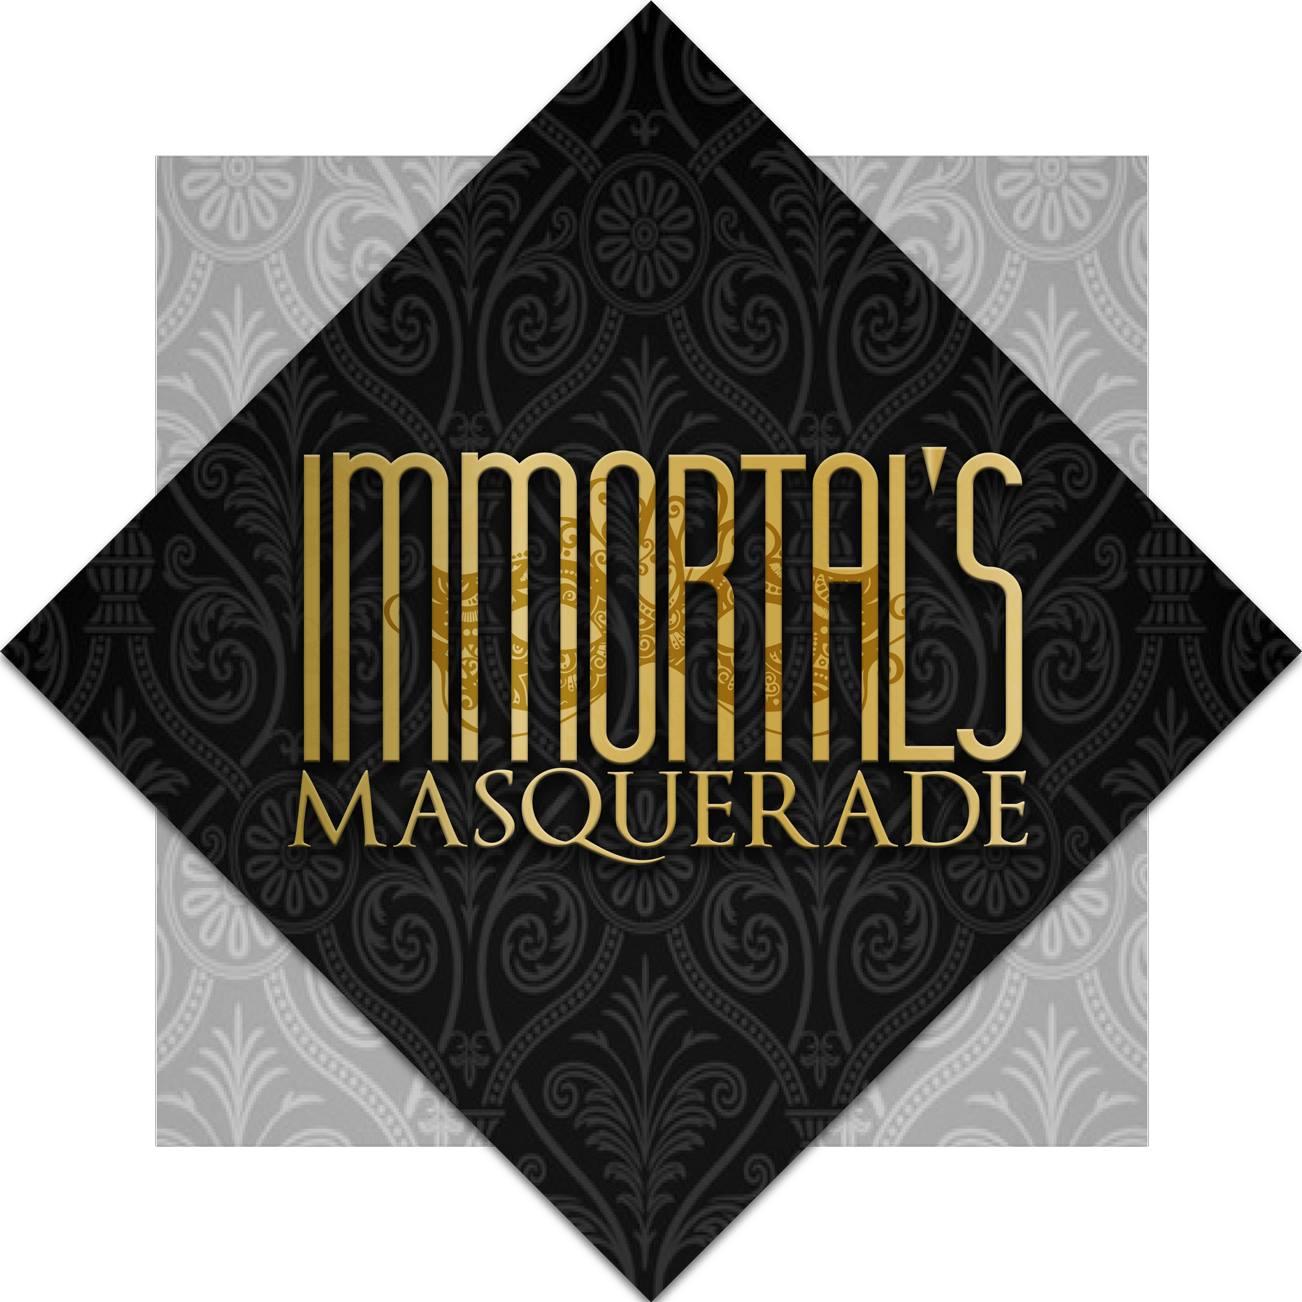 IMMORTAL'S MASQUERADE   Music by Matt Hahn, Battery by Chris Cruz-Vargas